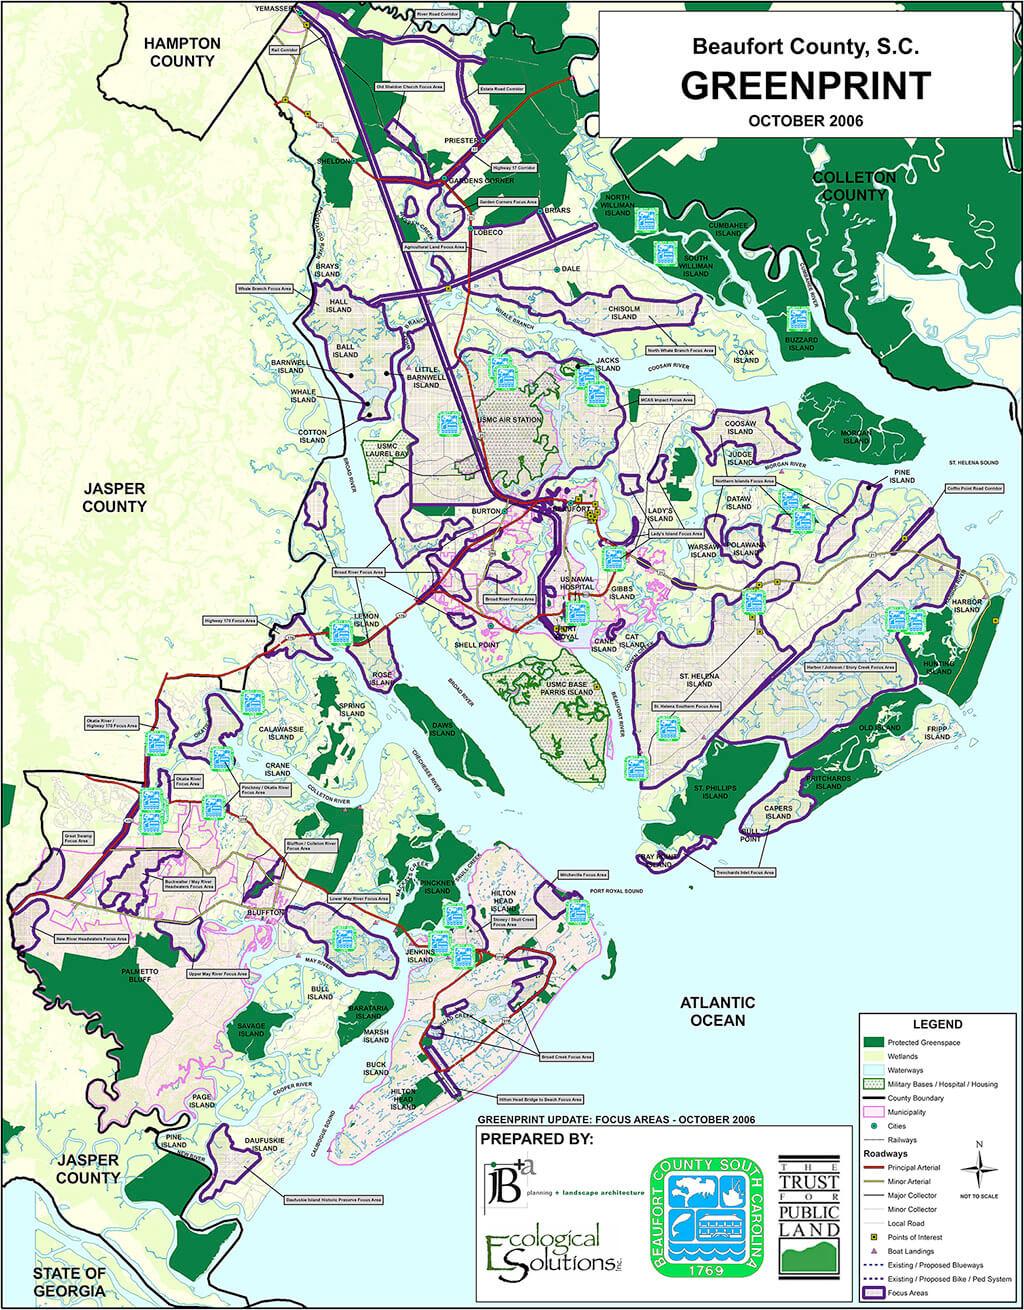 2006-Beaufort County Greenprint-Map